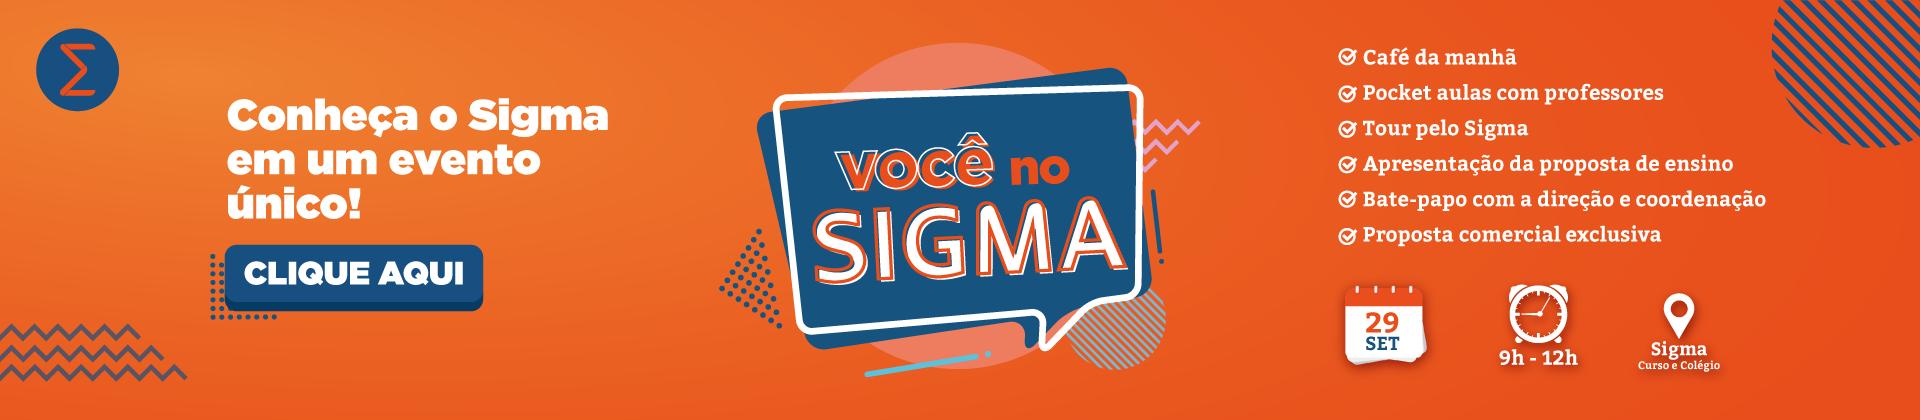 banner-voce-no-sigma